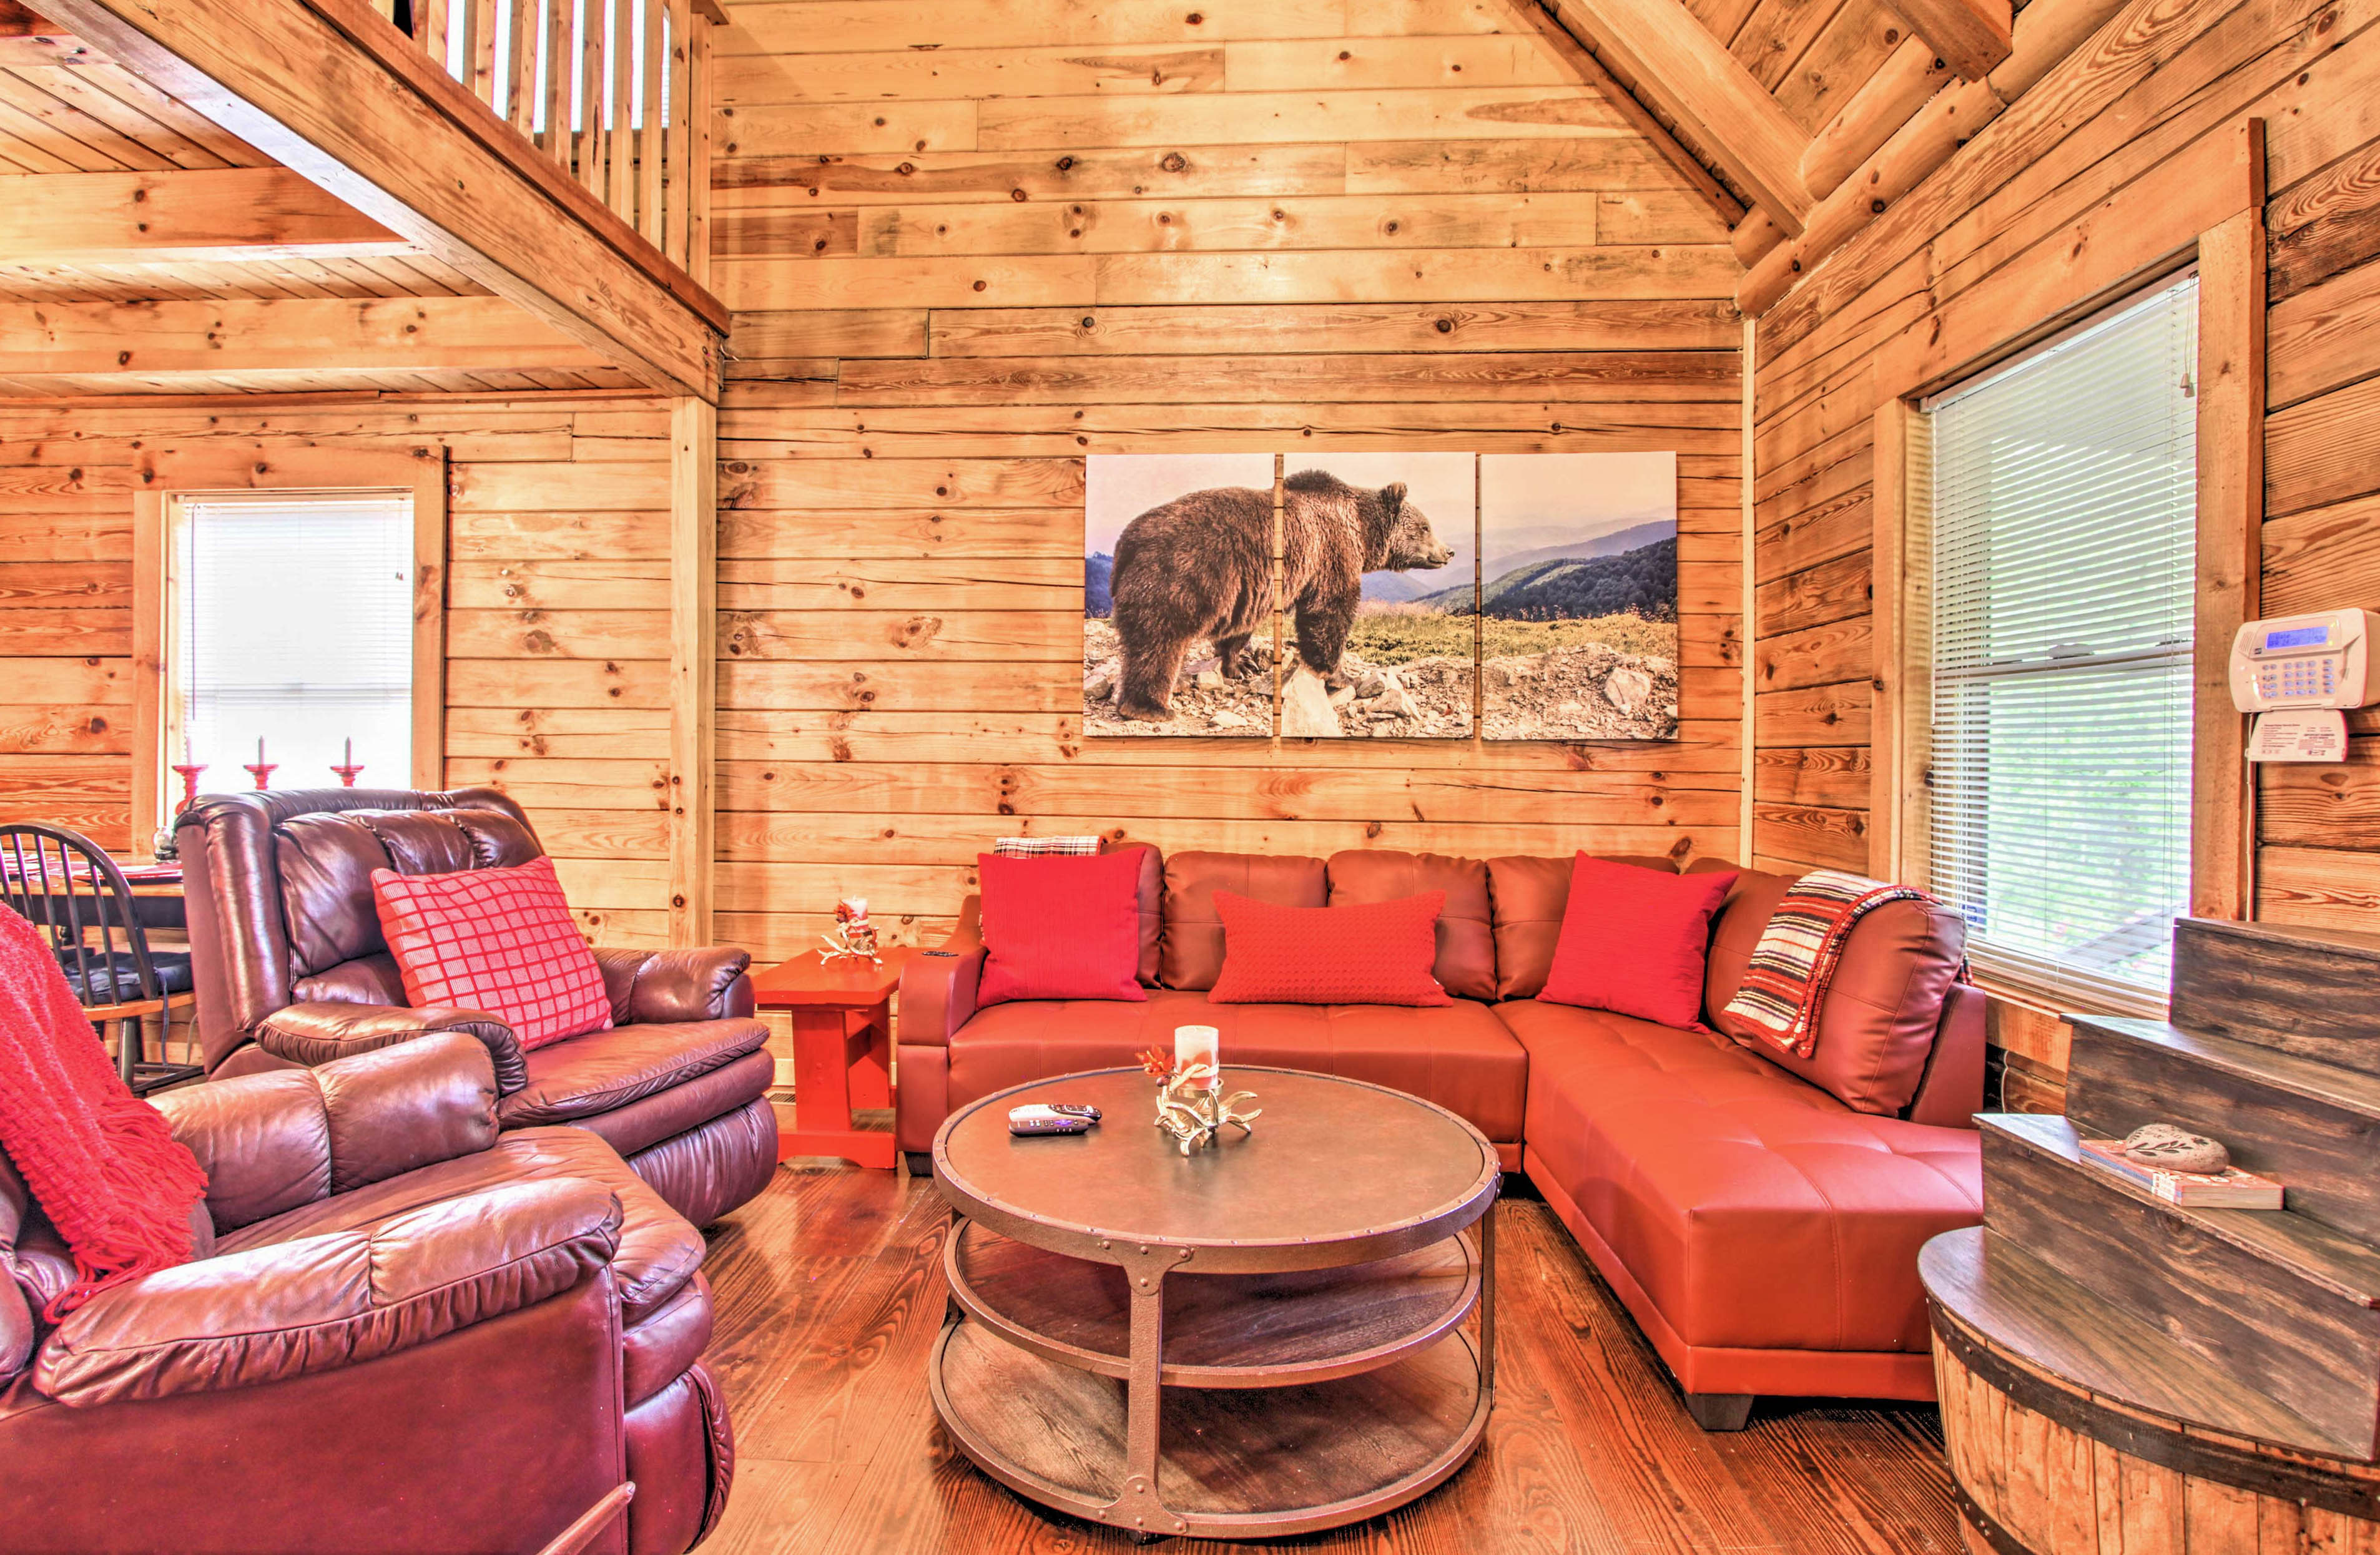 Inside you'll find rustic interior design and hardwood floors.